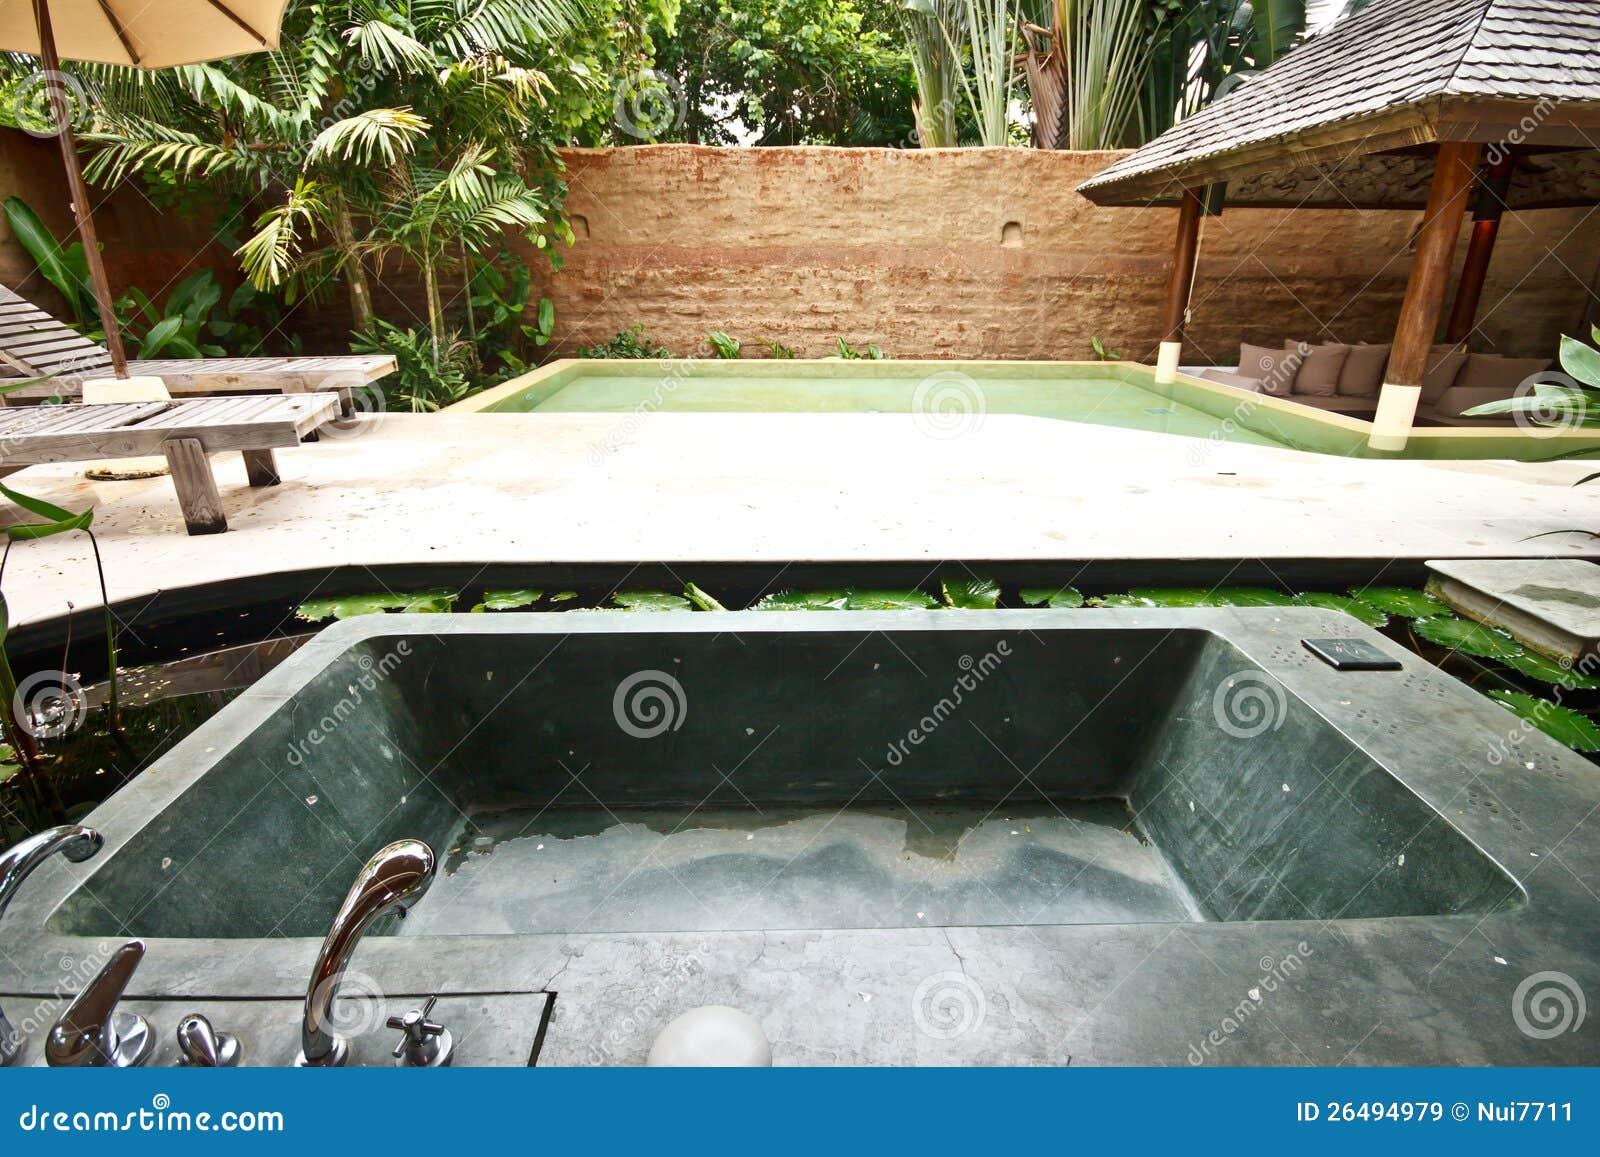 Vasca Da Bagno Esterna : Vasca da bagno esterna della jacuzzi in giardino 4 immagine stock